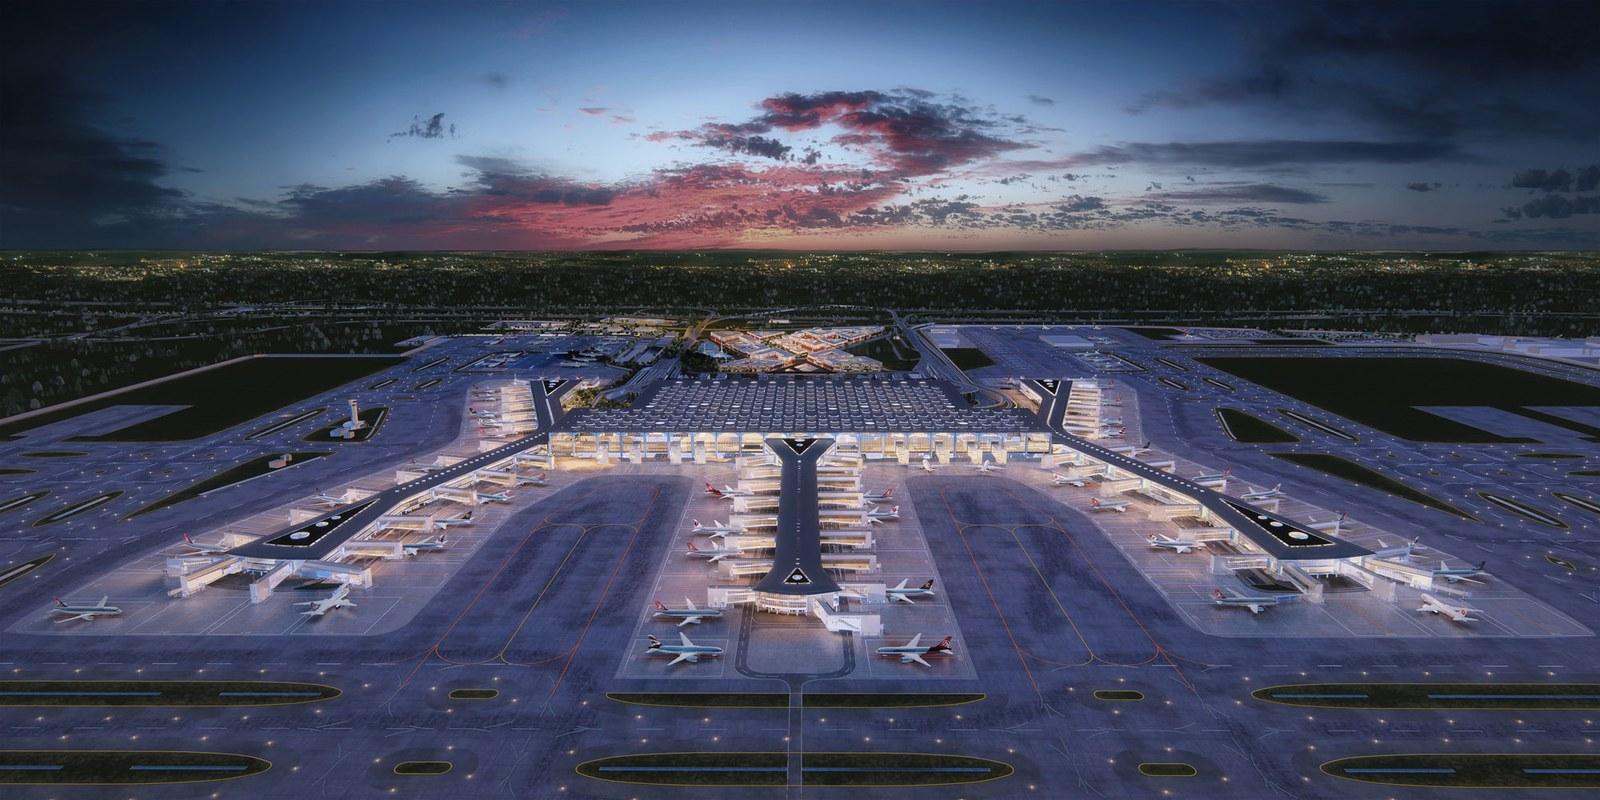 5 Bandara Paling Futuristik di Dunia